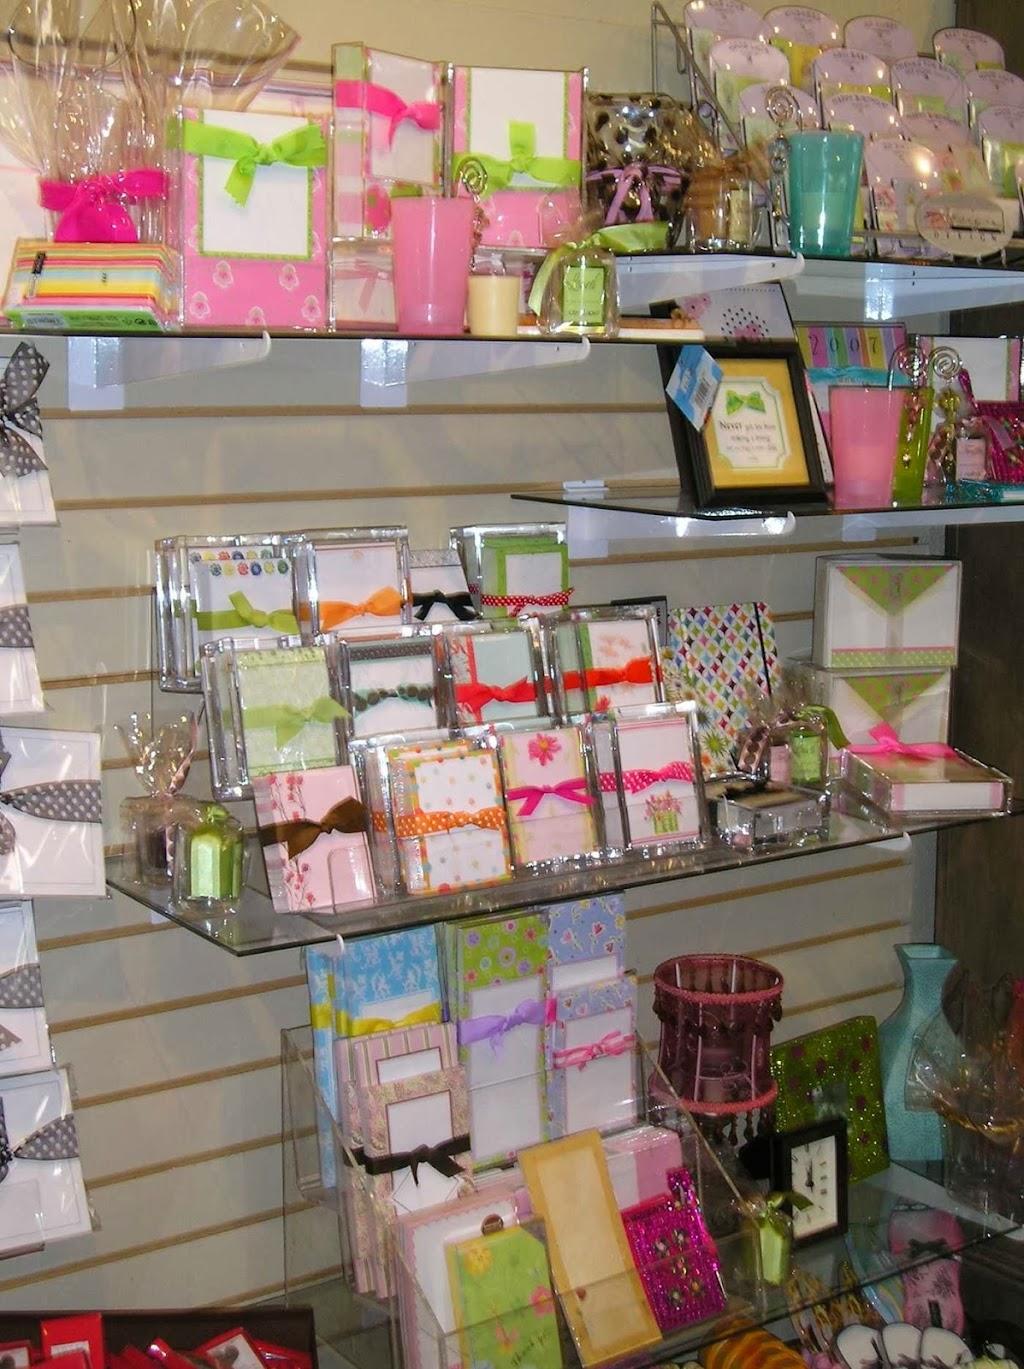 Magic Pen & Party - store  | Photo 3 of 10 | Address: 422 S Main St, Grapevine, TX 76051, USA | Phone: (817) 424-4207